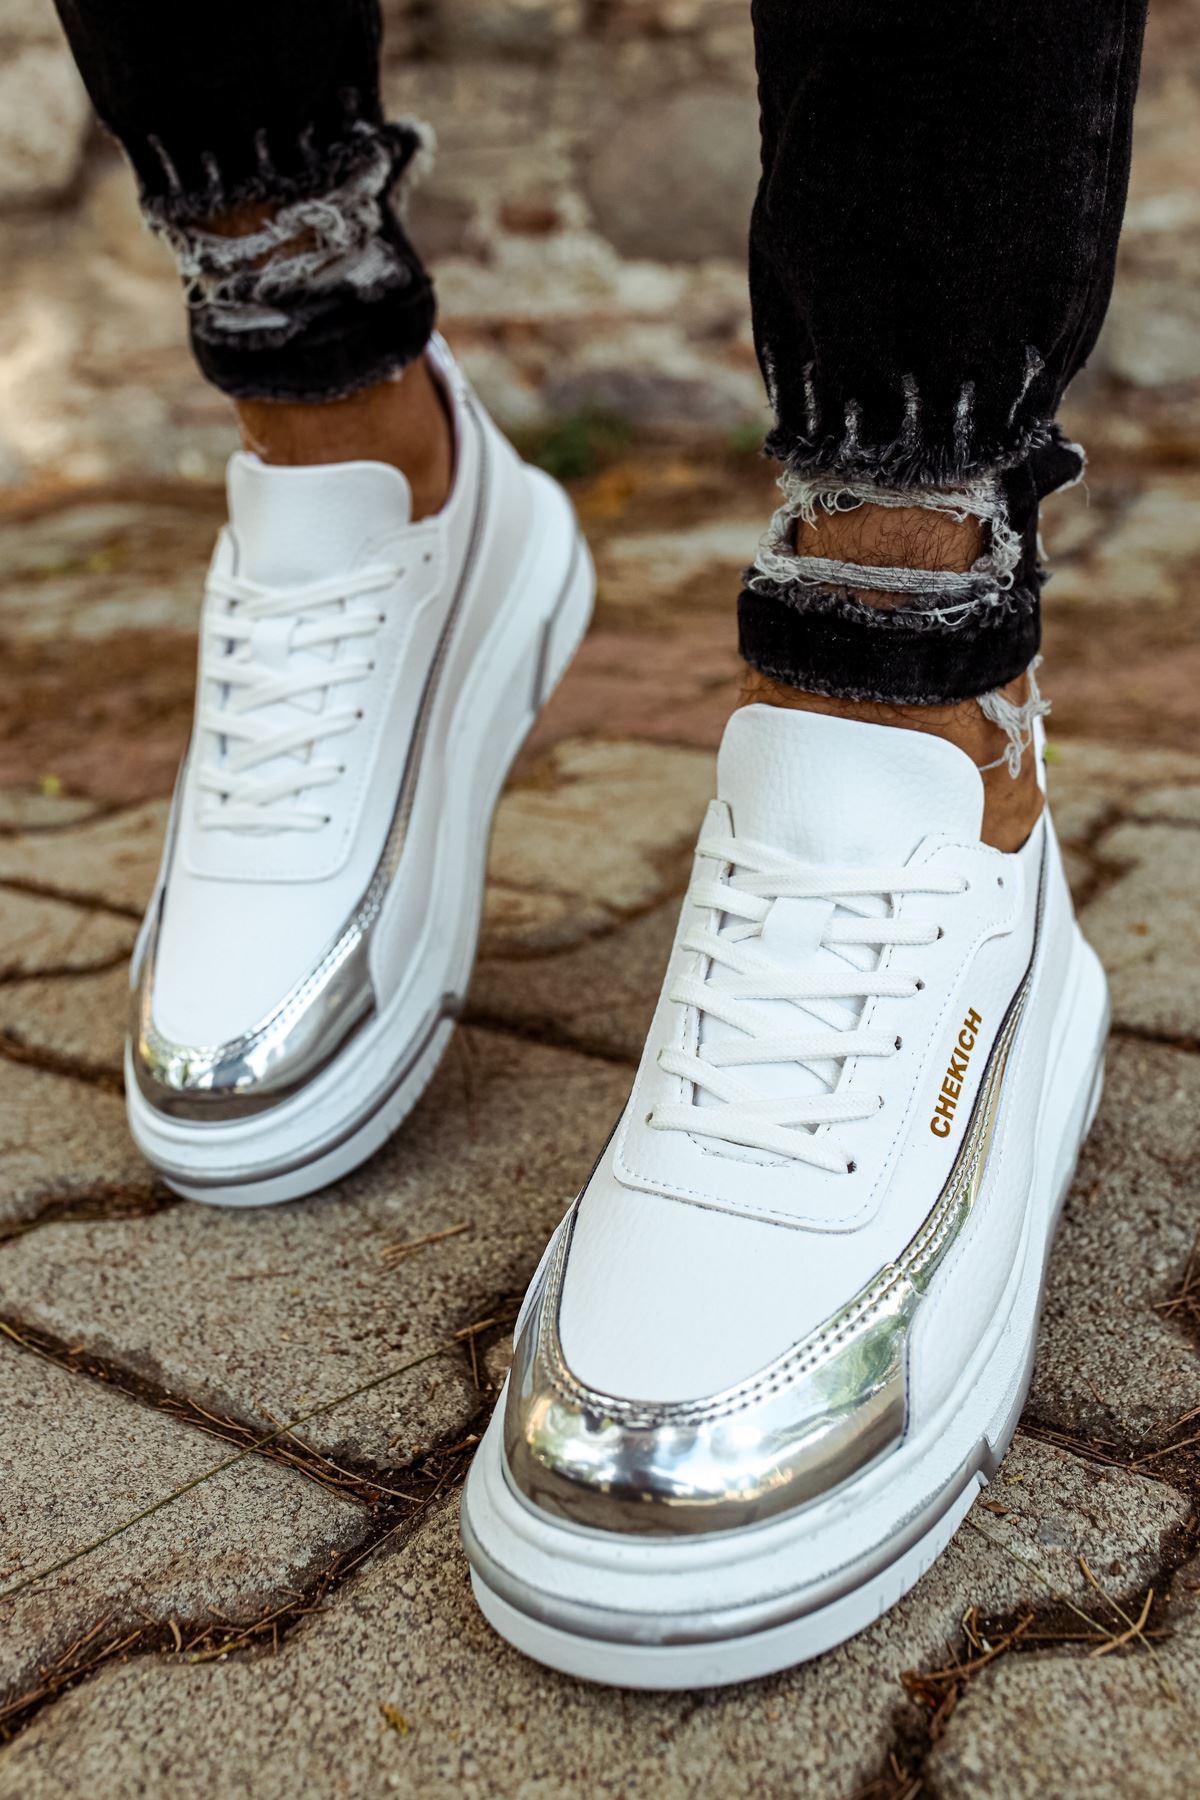 Chekich CH041 BT Erkek Ayakkabı BEYAZ / GUMUS